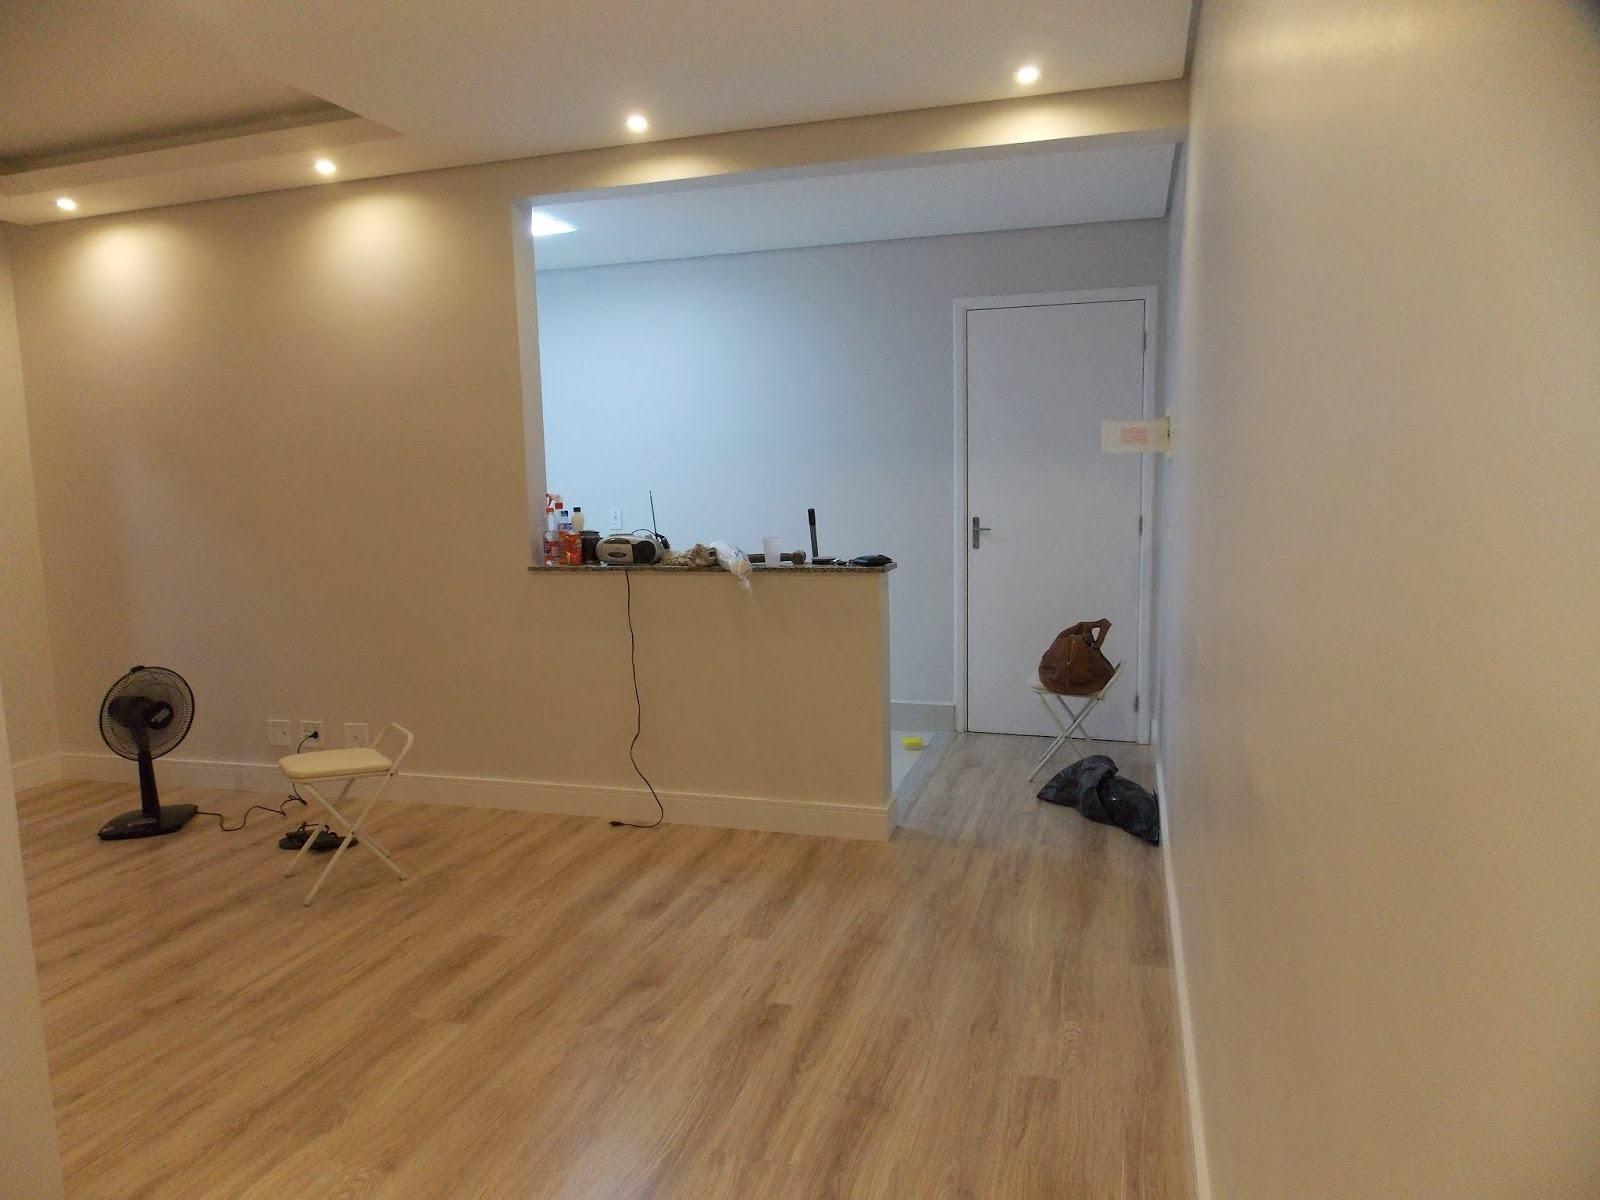 Modelos de laminado para apartamento pequeno pisos for Pisos apartamentos pequenos